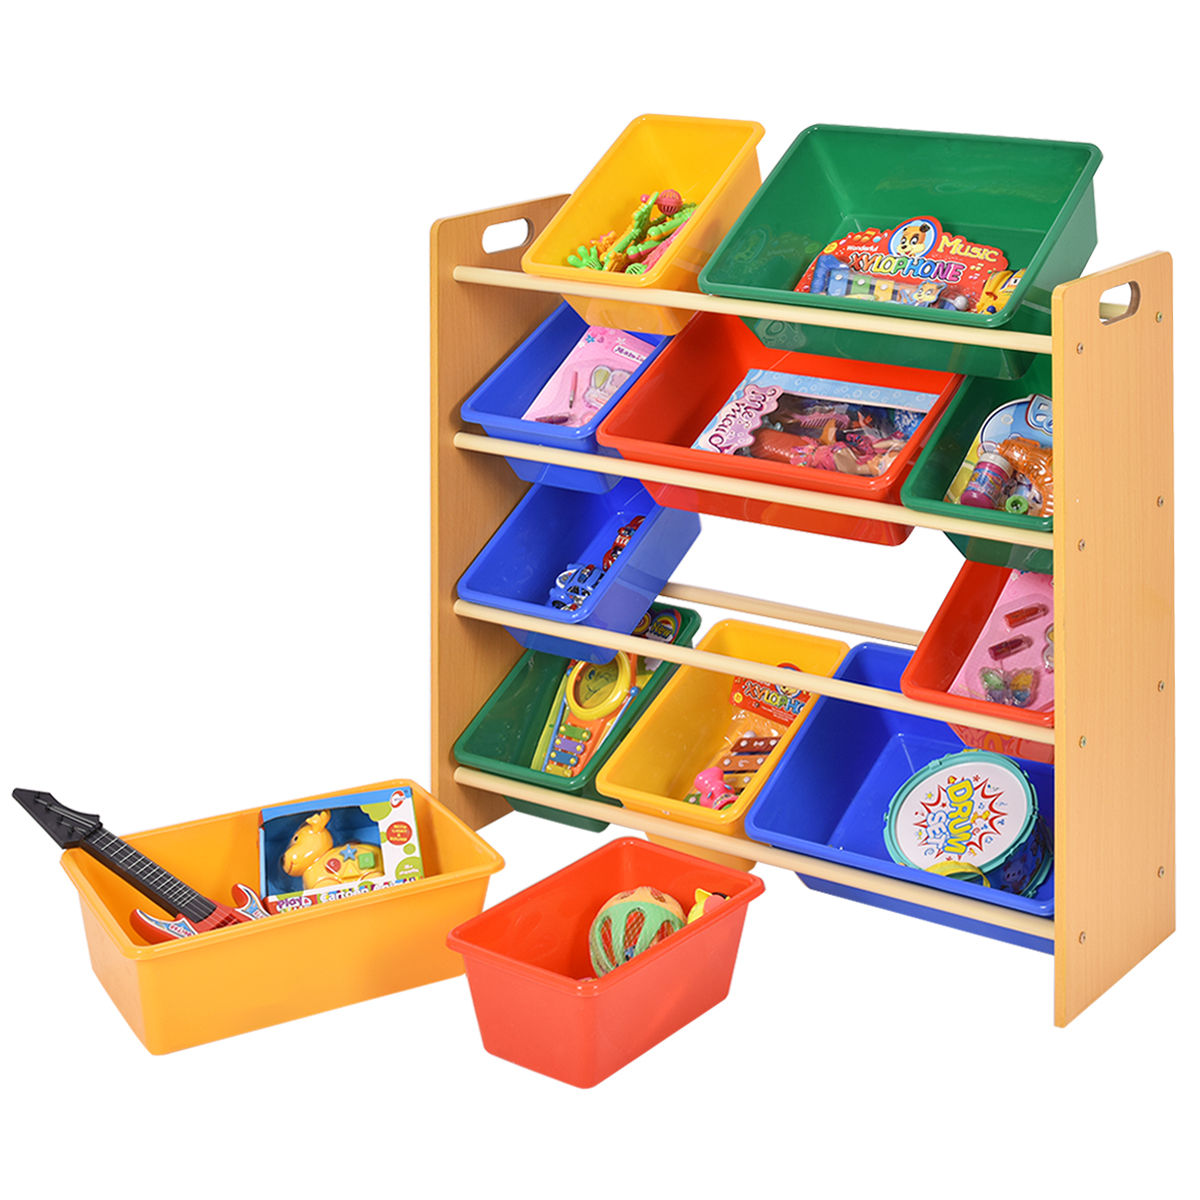 Toy Bin Organizer Kids Childrens Storage Box Playroom Bedroom Shelf Drawer